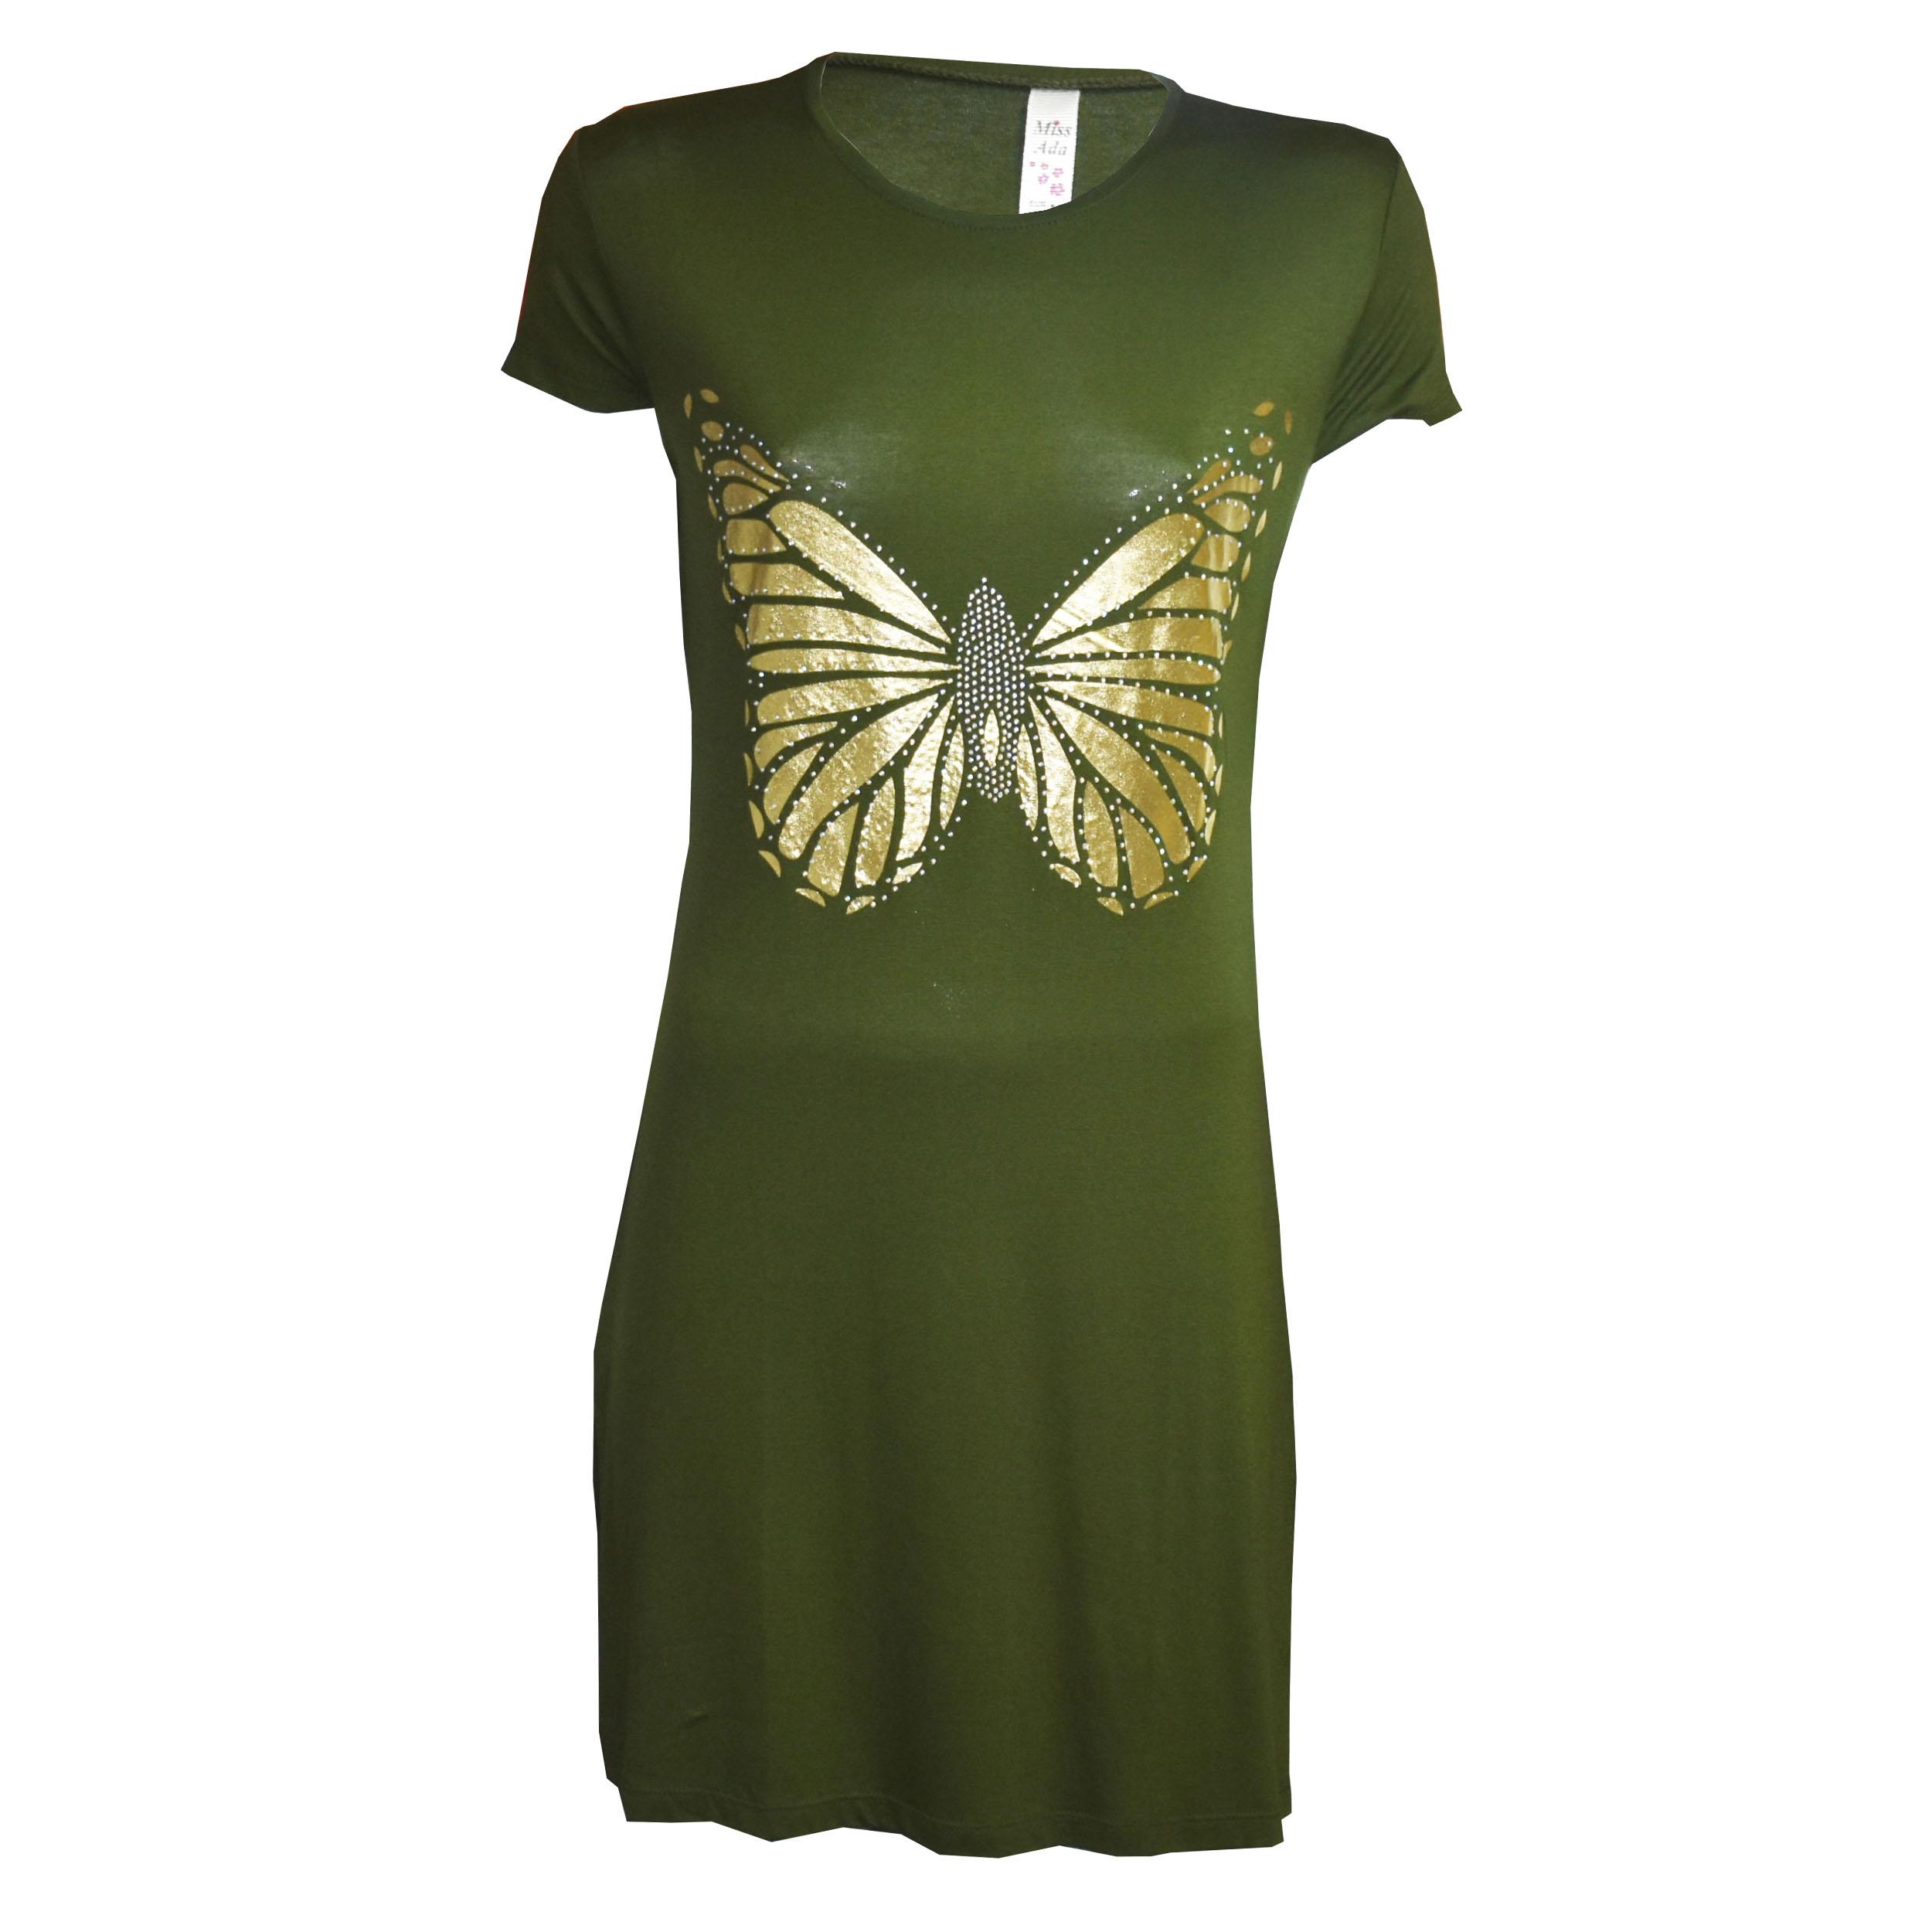 لباس خواب زنانه MISS LOVE کد -PGJ8885